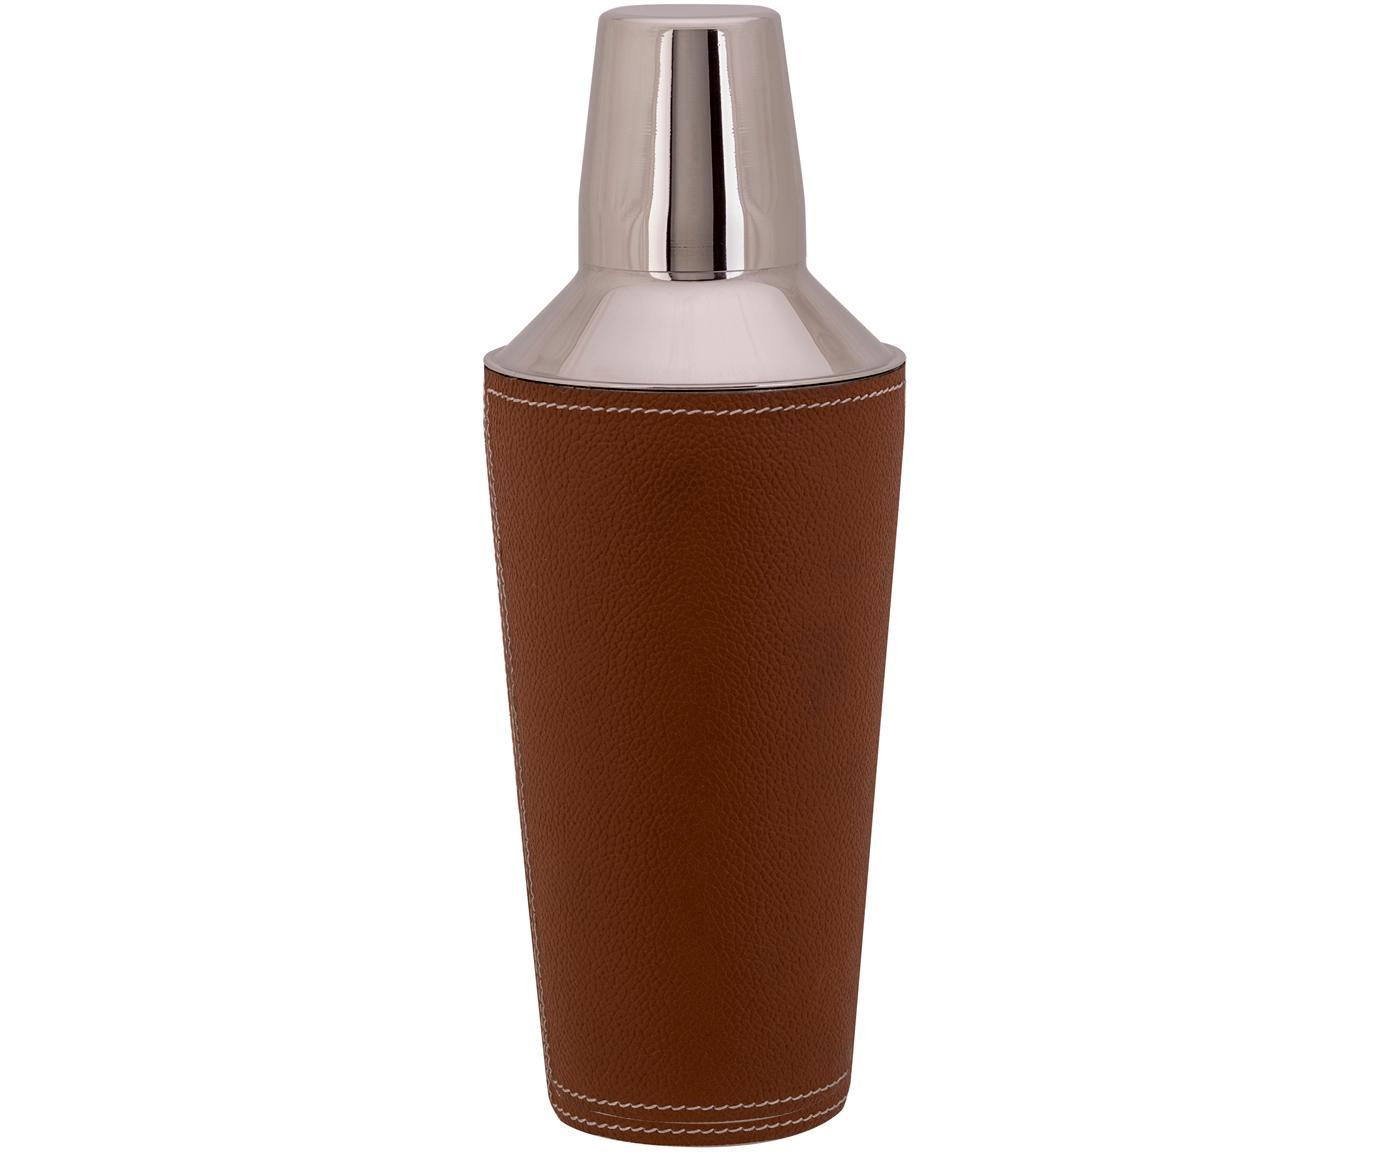 Agitatore per cocktail Lahore, Shaker: acciaio inossidabile, Rivestimento: pelle, Marrone, acciaio, Ø 9 x Alt. 25 cm